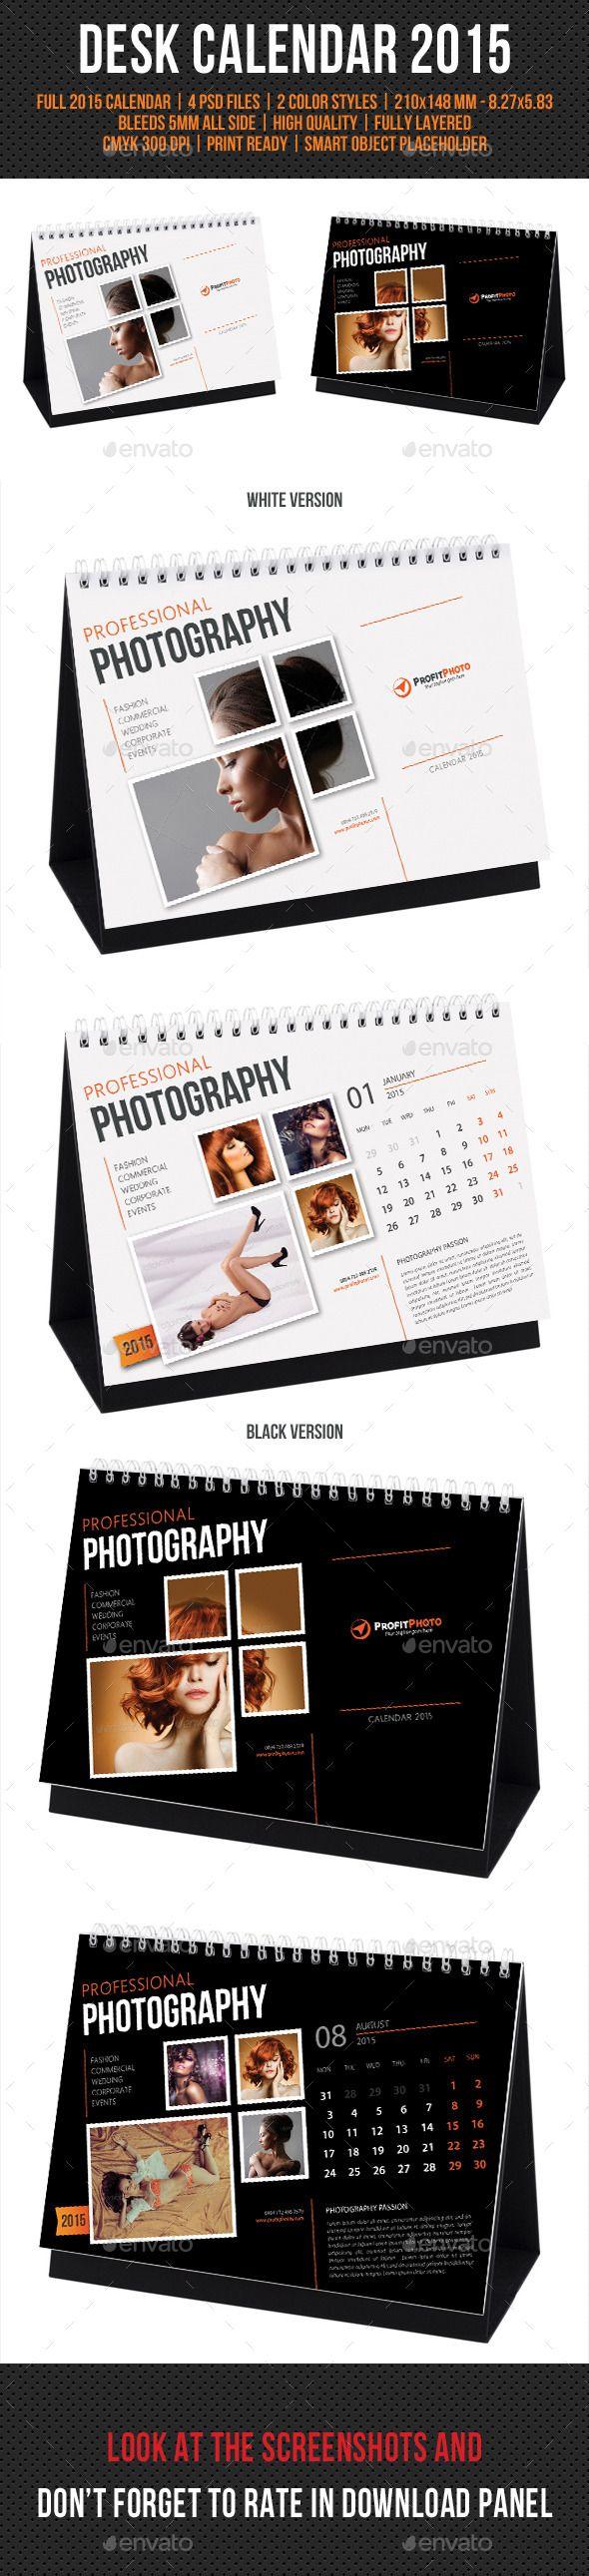 Creative Desk Calendar 2015 Template | Buy and Download: http://graphicriver.net/item/creative-desk-calendar-2015/9537572?ref=ksioks